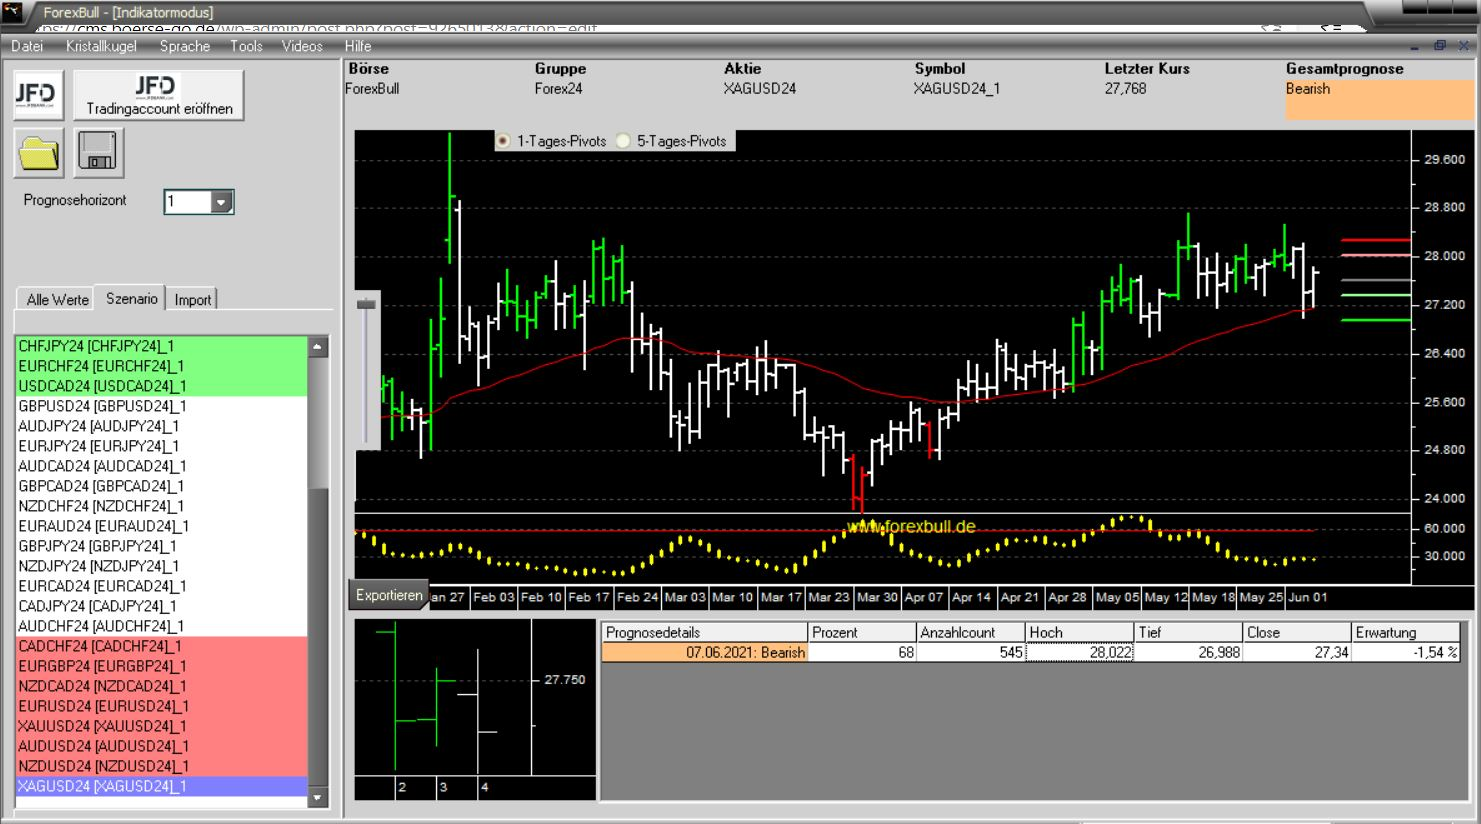 Morning-Briefing-ForexBull-GOLD-und-SILBER-mit-Short-Setups-Chartanalyse-JFD-Bank-GodmodeTrader.de-2